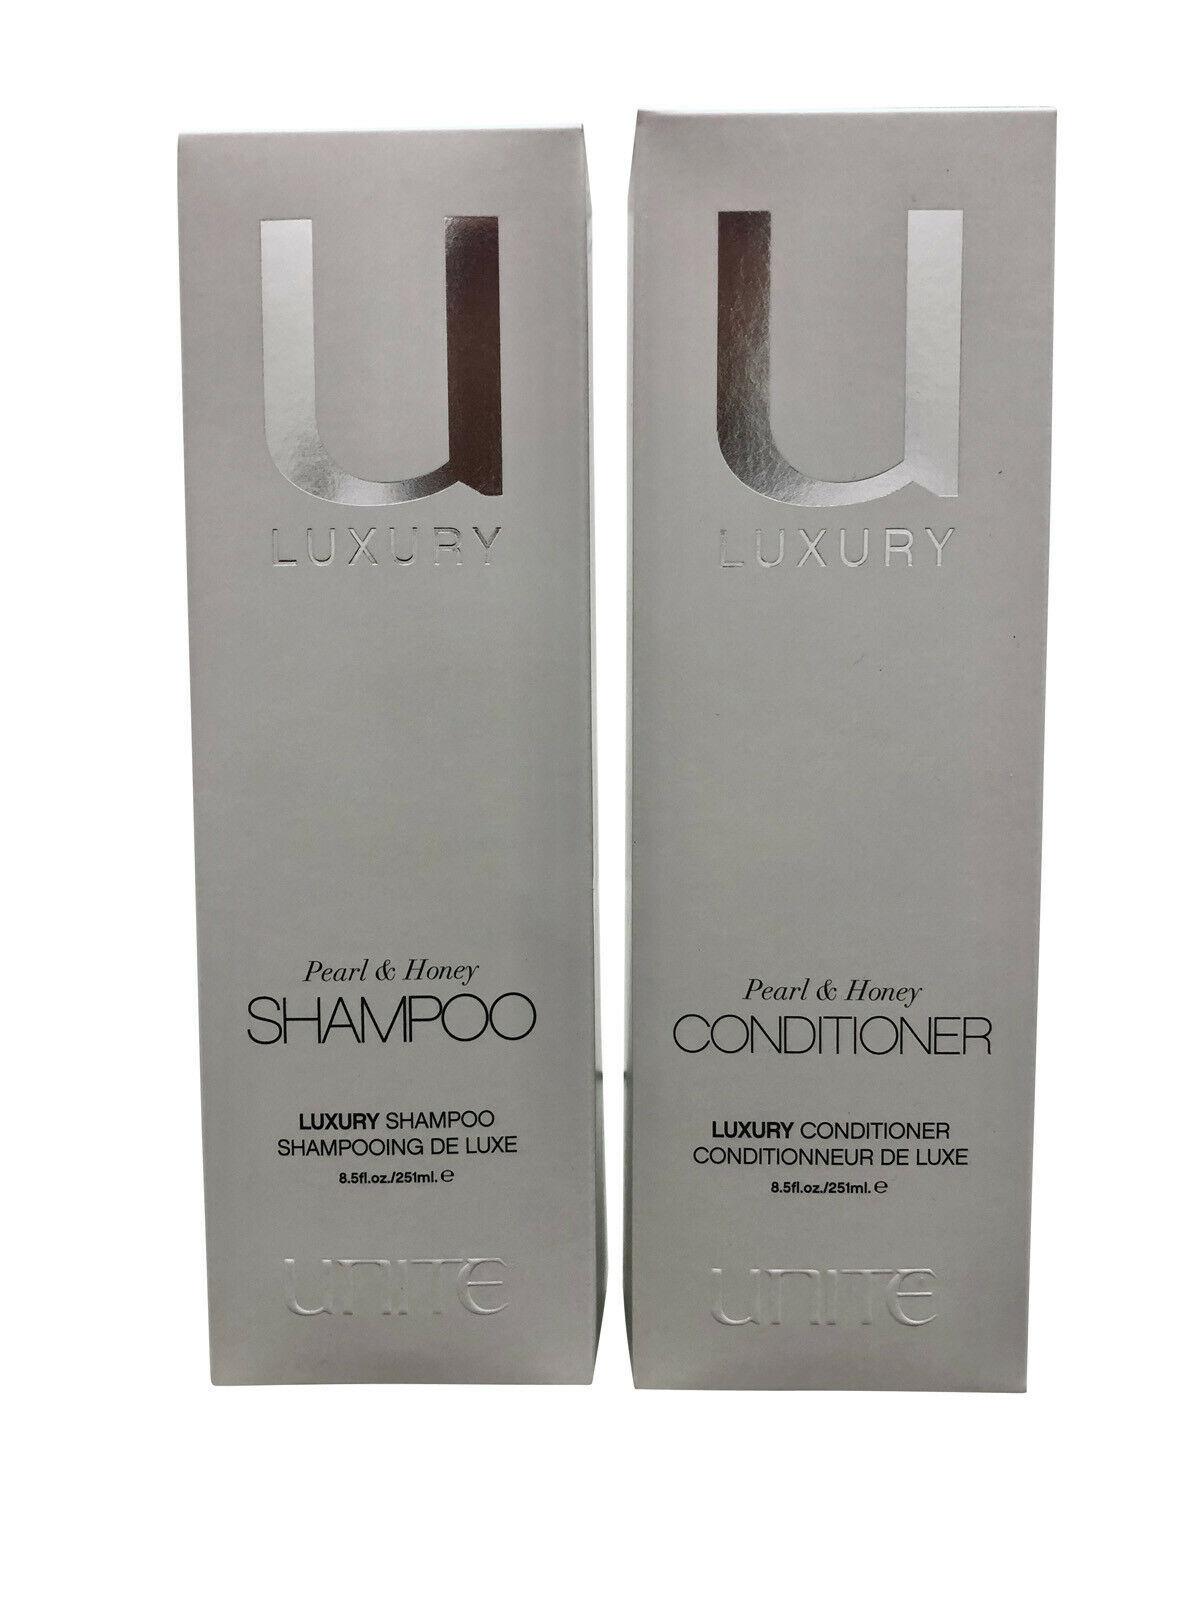 Unite Luxury Pearl & Honey Shampoo & Conditioner Set 8.5 OZ Each - $48.90